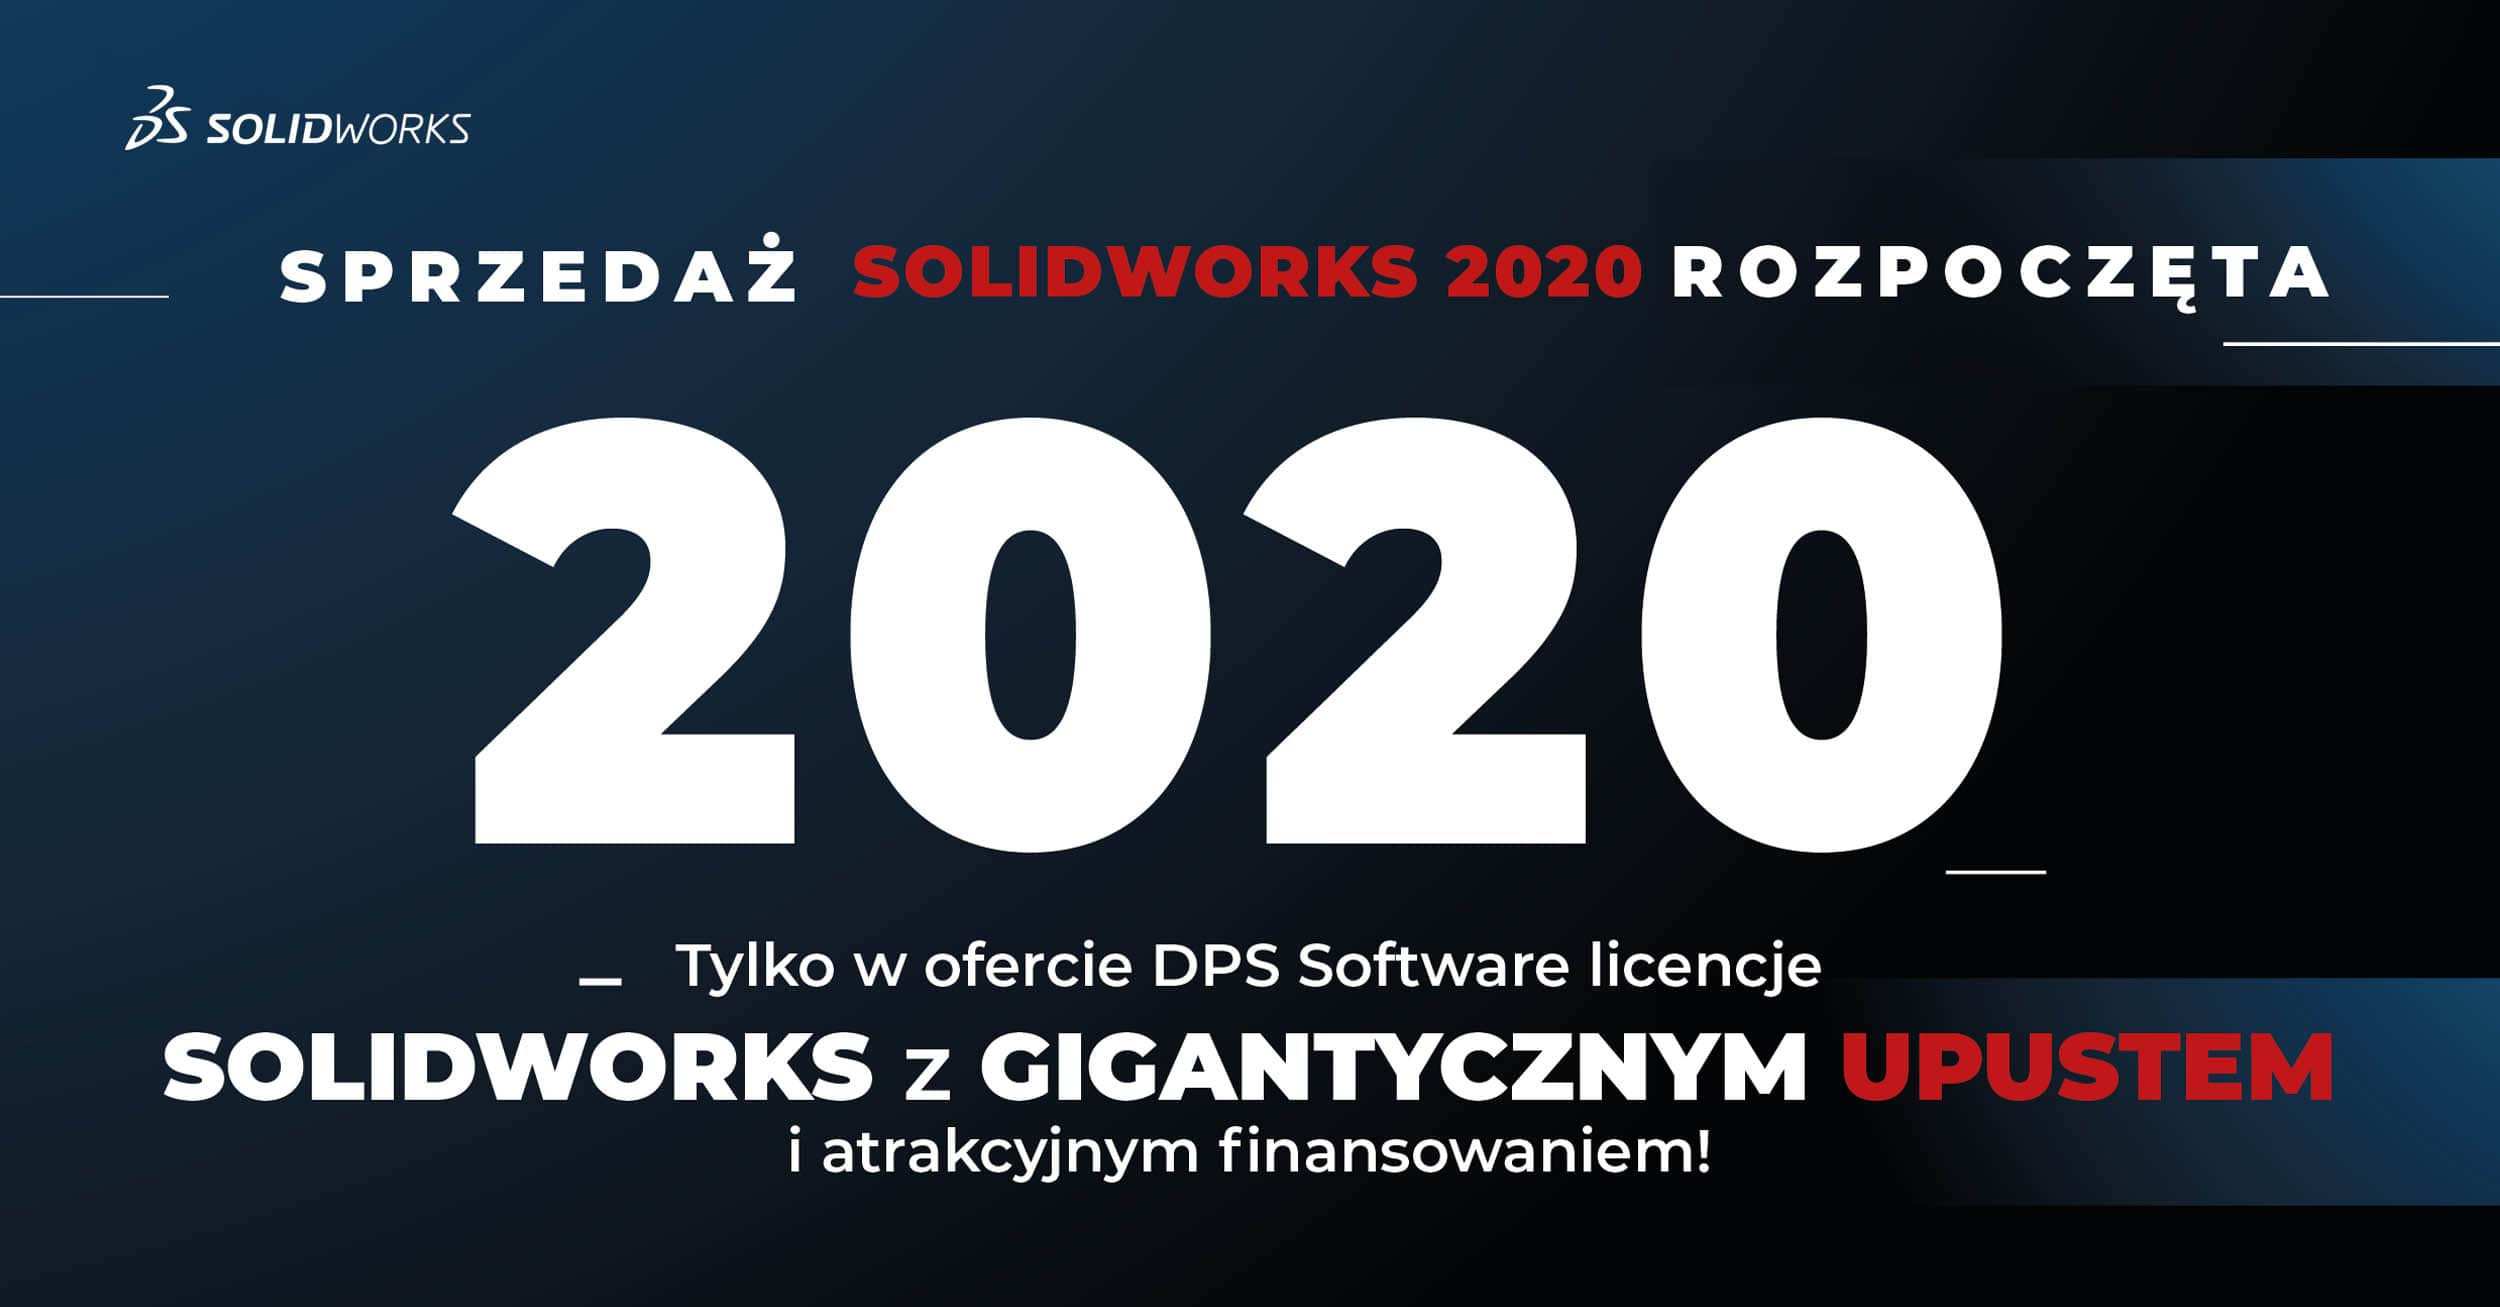 SOLIDWORKS 2020 Promocja